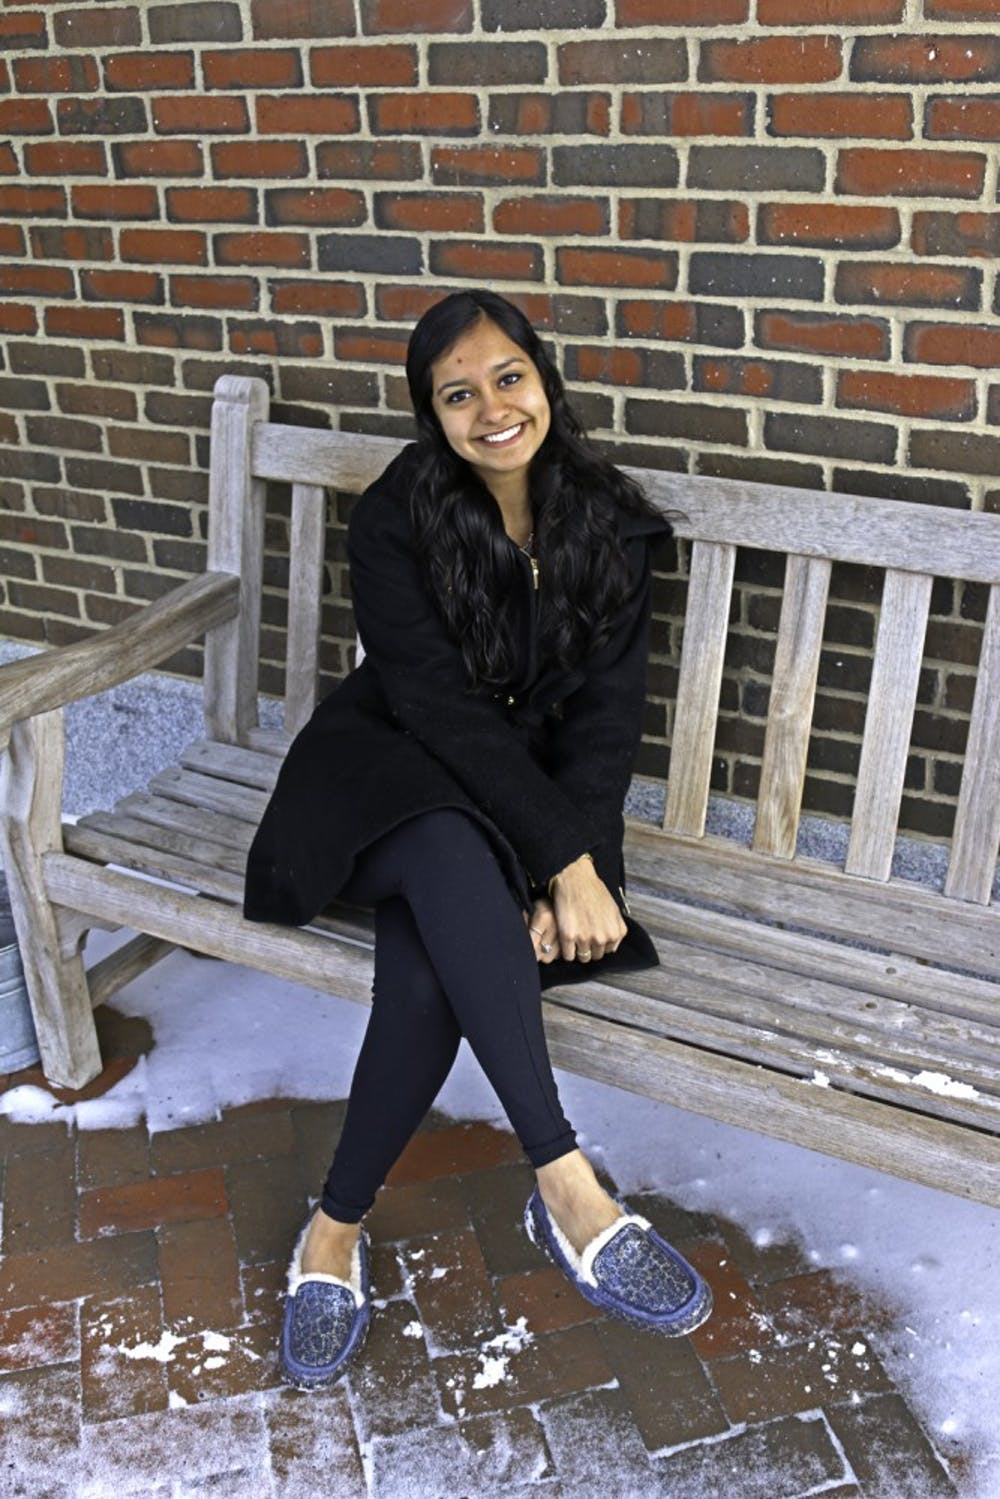 02-11-15-arts-student-spotlight-alice-harrison